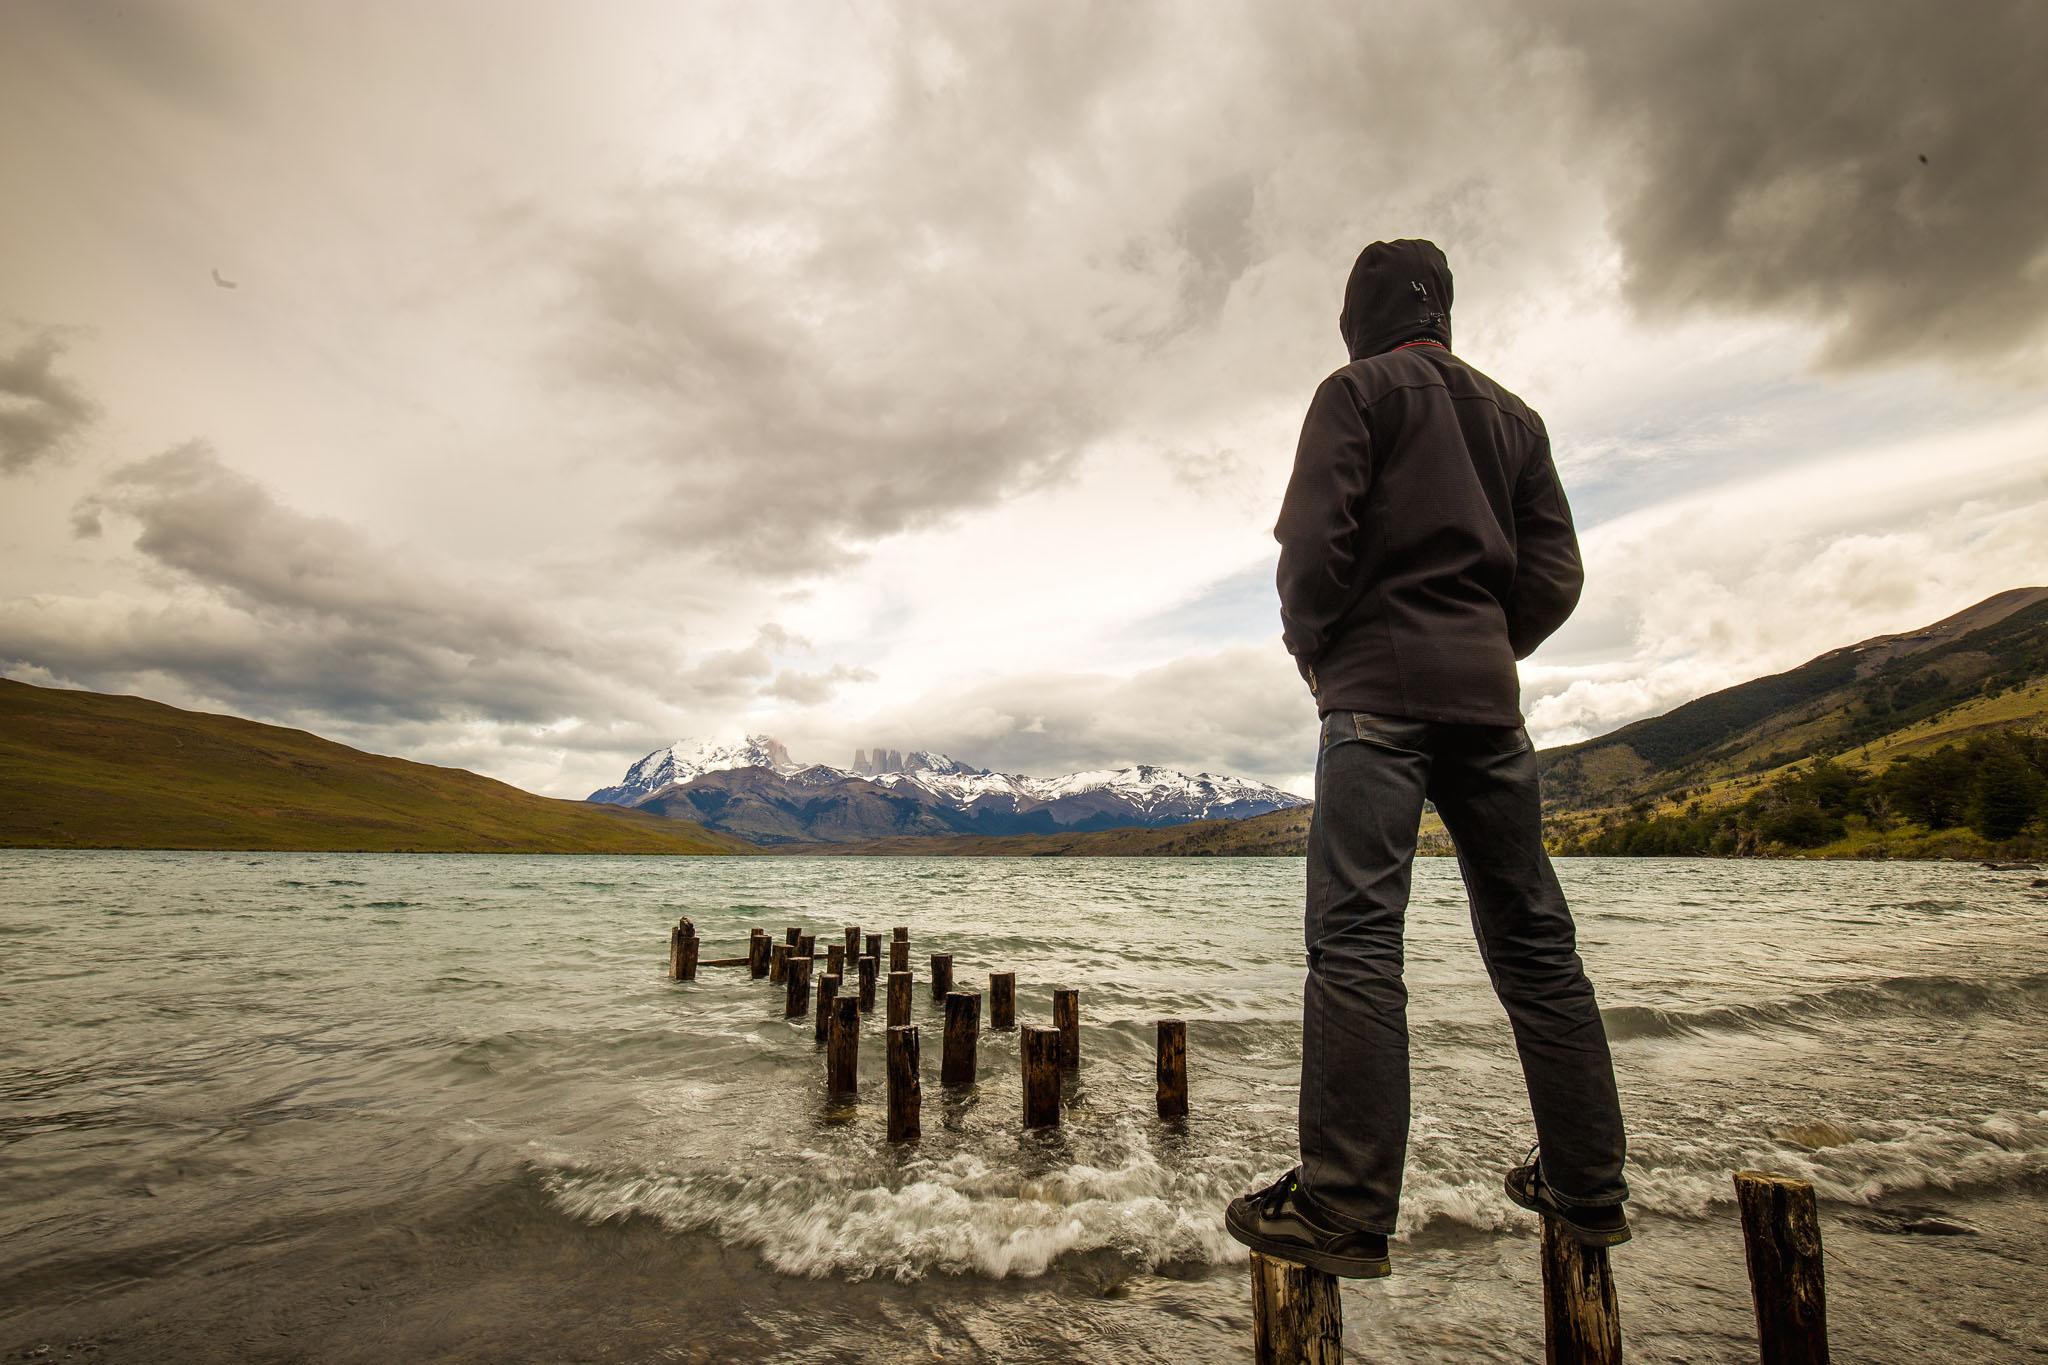 laguna-lake-azul-Wedding-Travellers-Overlanding-Destination-Wedding-Chile-Torres-del-Paine